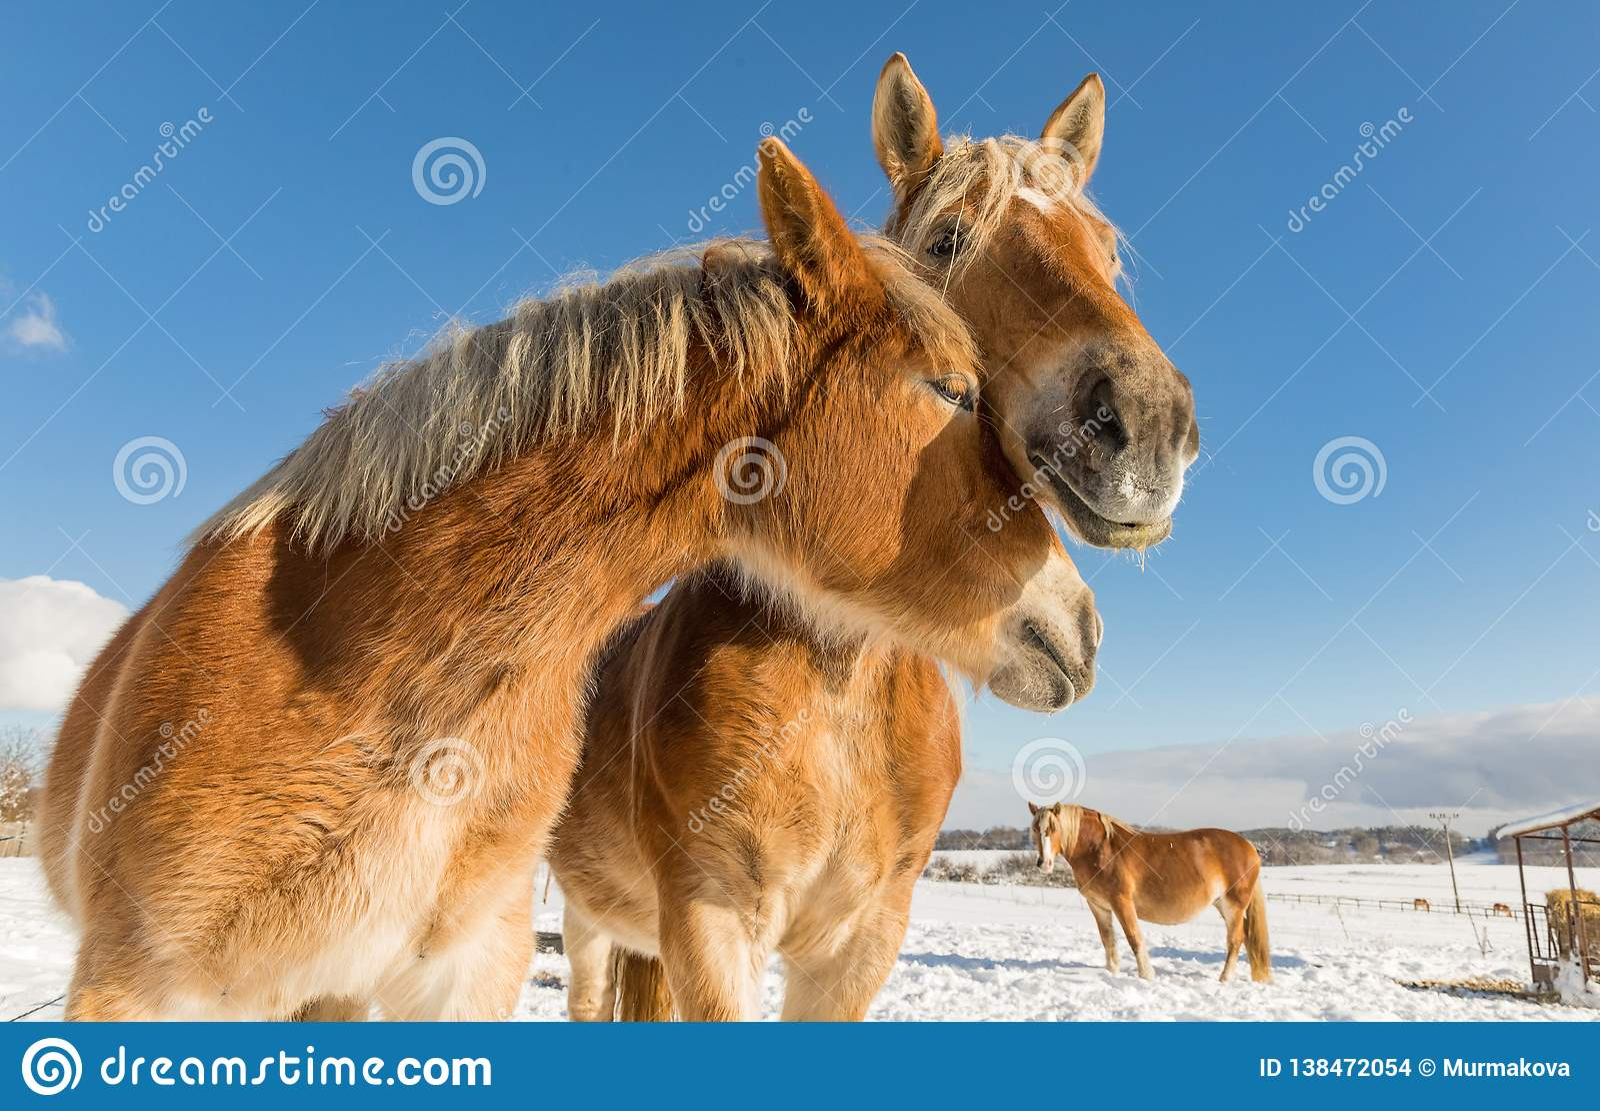 Two horse portrait close up in love, Horse love, Bohemian-Moravian Belgian horse in sunny day. Czech Republic